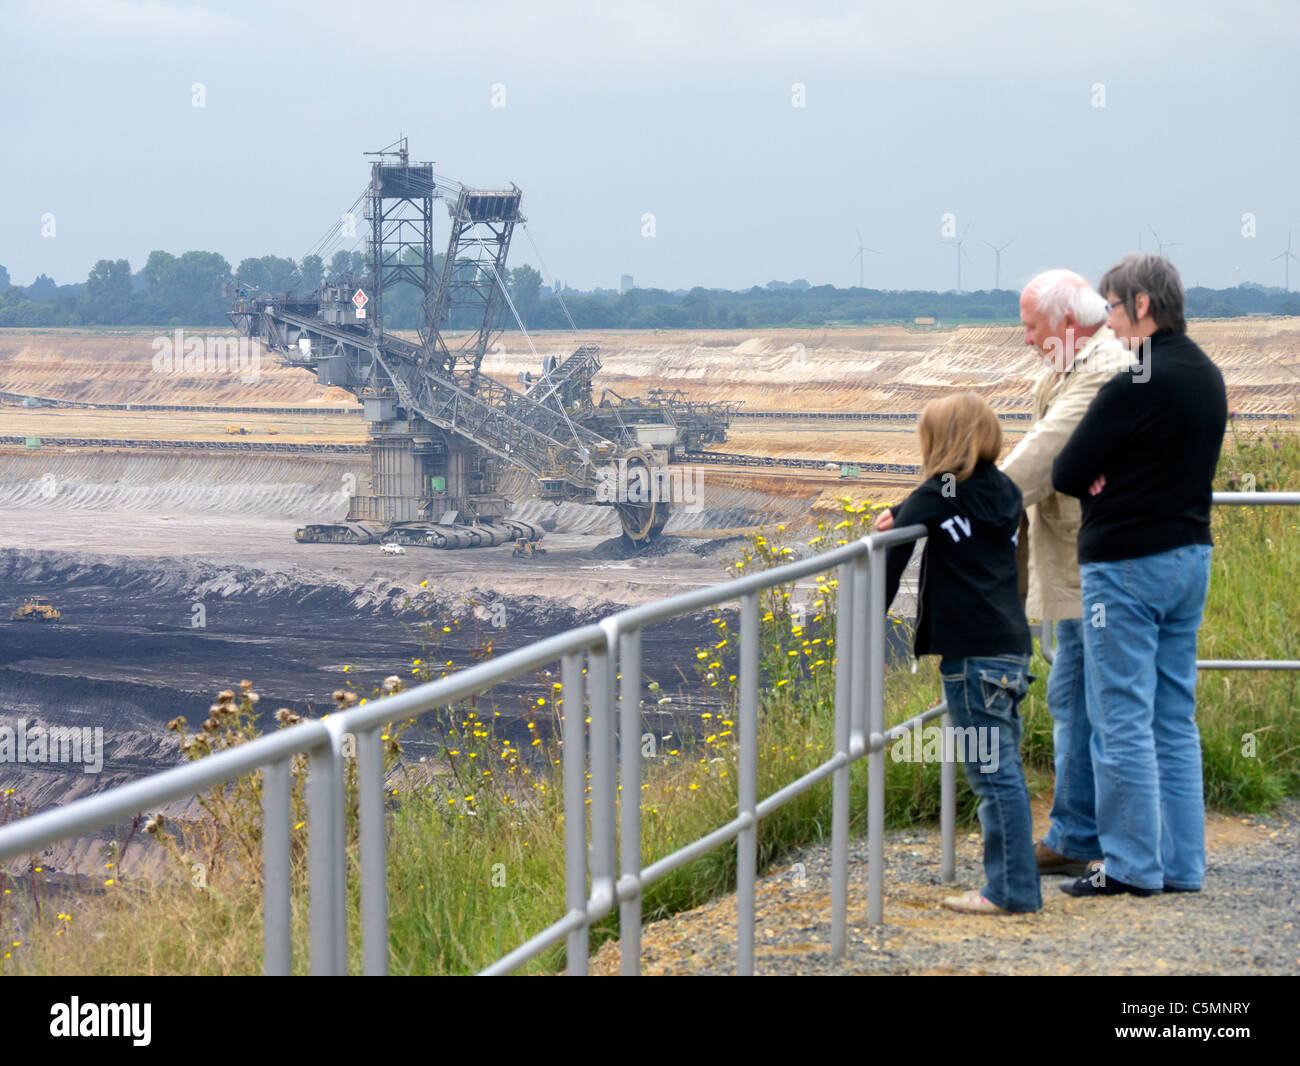 Visitors looking at RWE open-cast brown or lignite coal mine at Garzweiler in Northrhine Westfallia in Germany Stock Photo